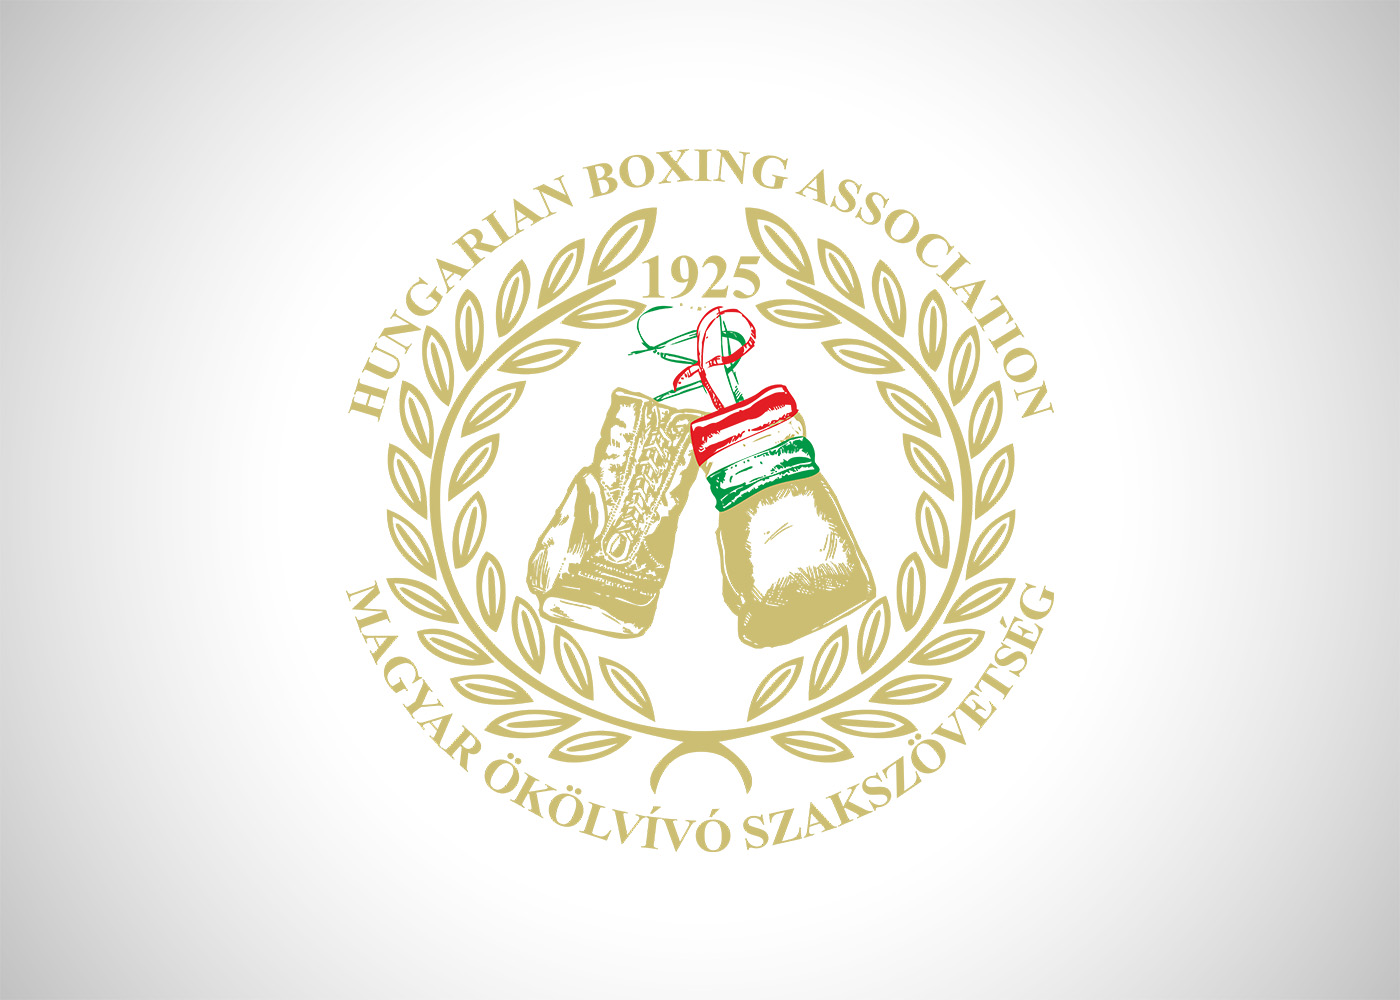 India's Rohit Mor made a fantastic debut at the AIBA World Boxing Championships